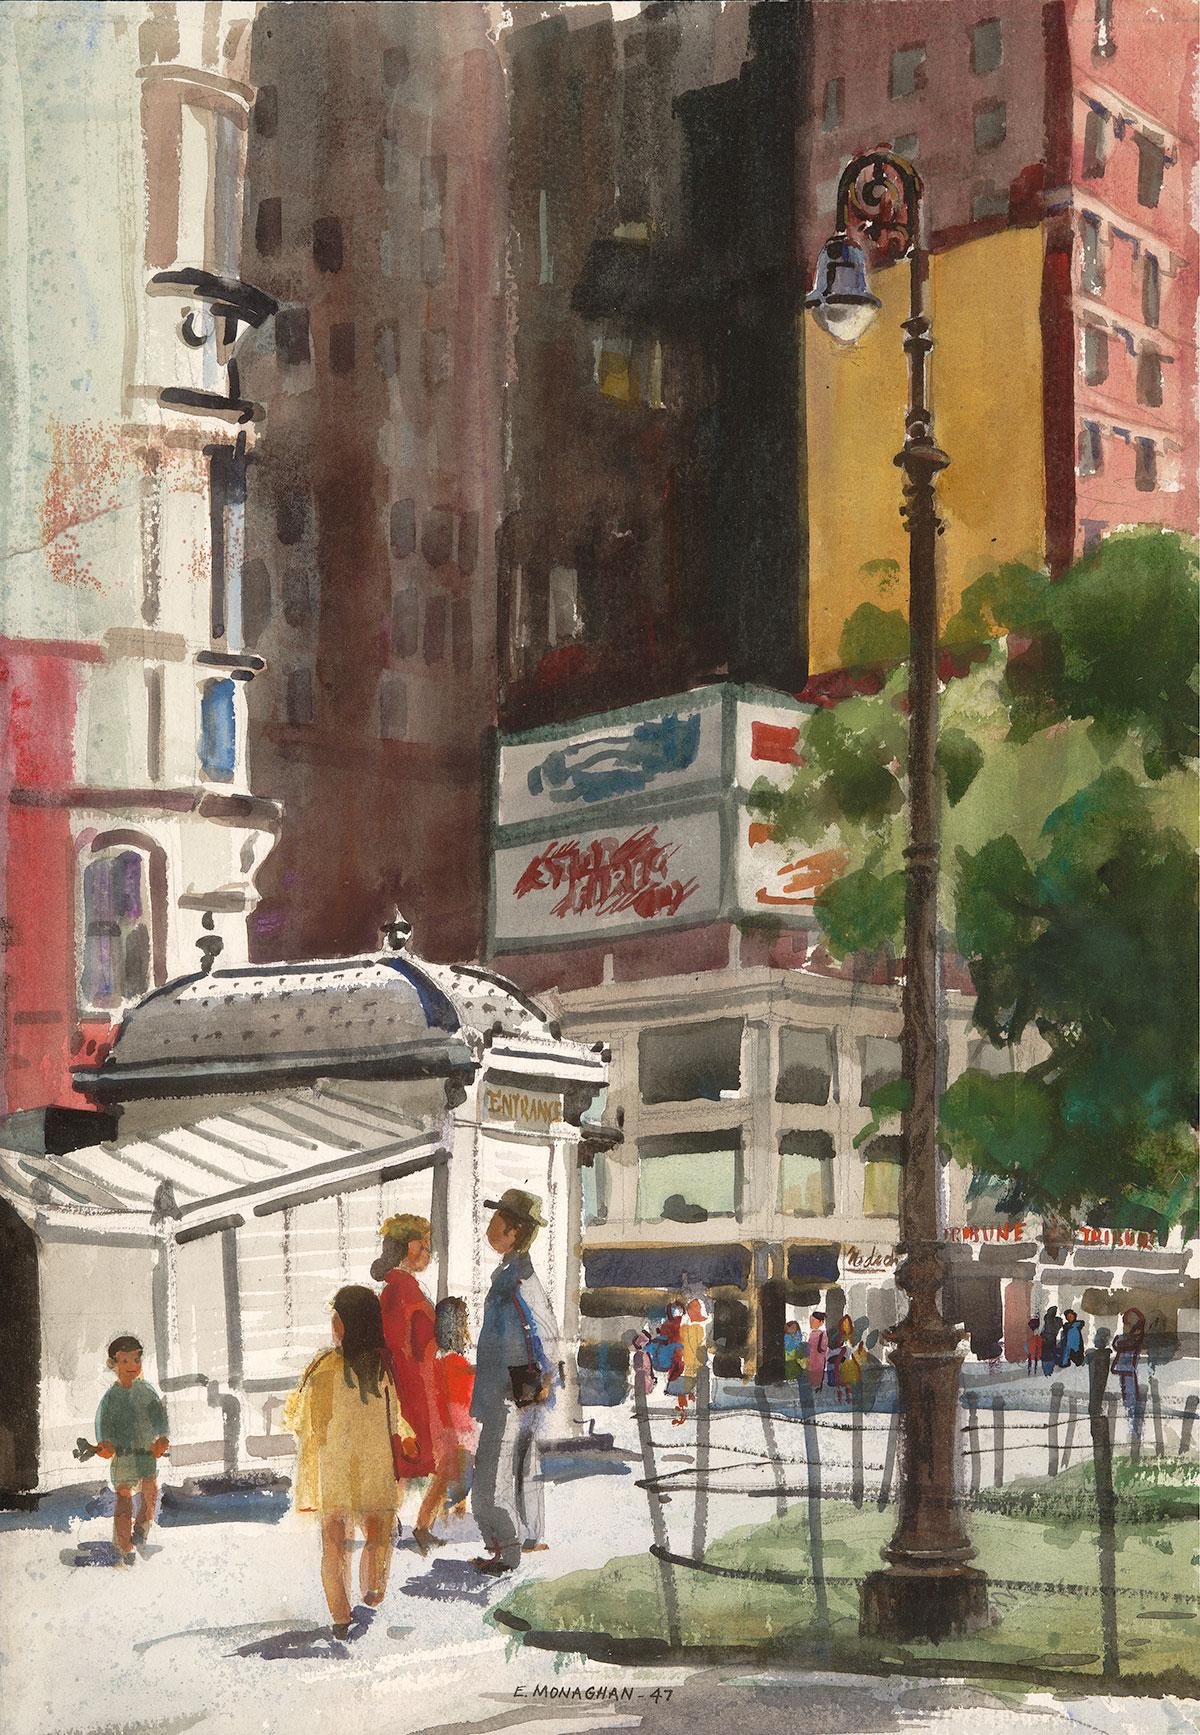 """Manhattan Detail"" 1940s © Eileen Monaghan whitaker 14x20 inches Watercolor"